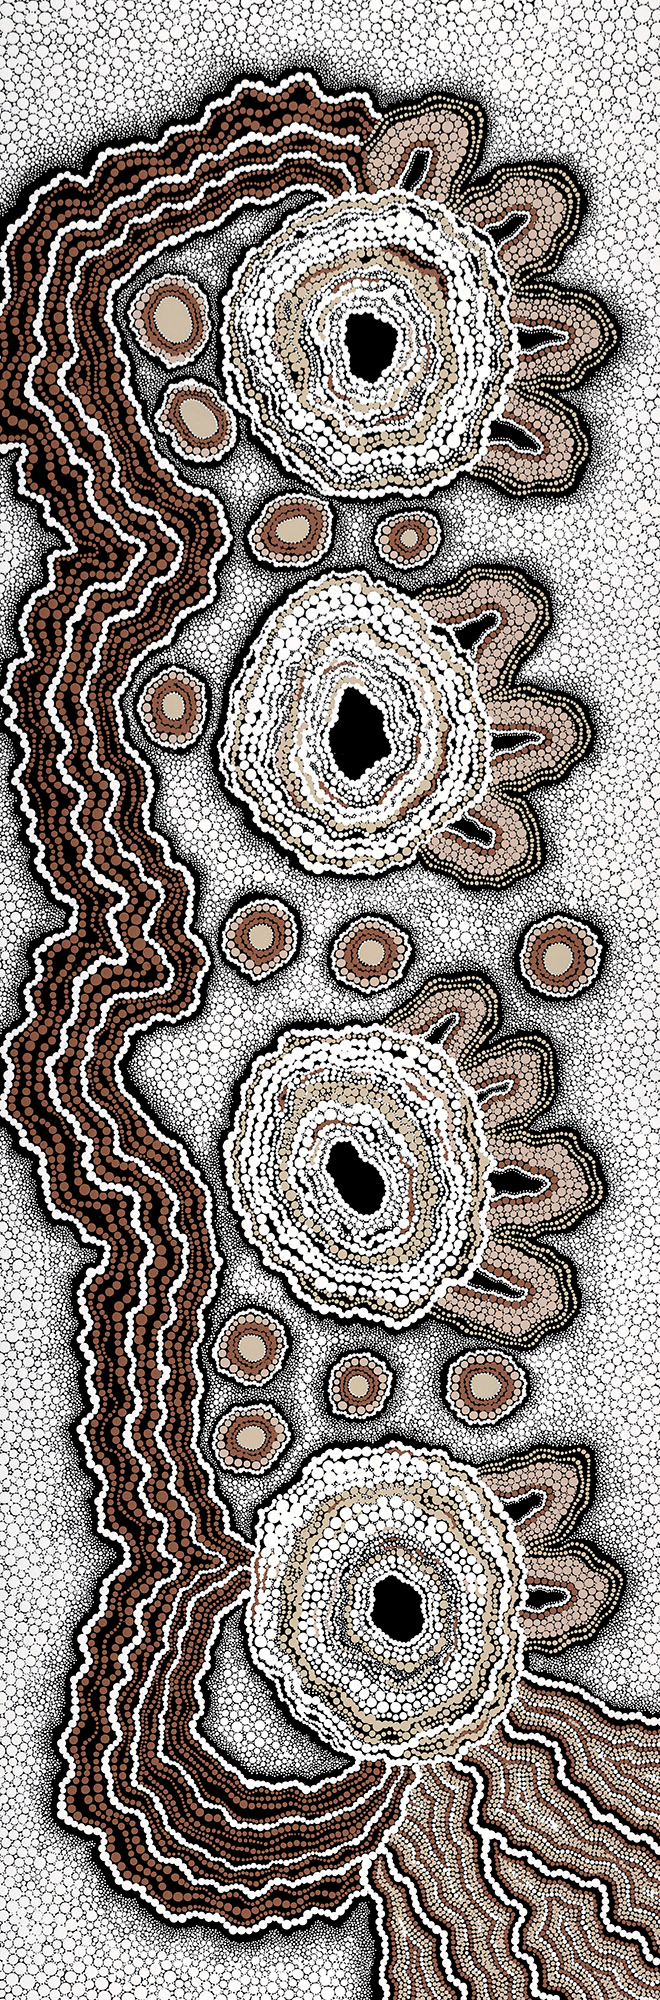 Birthing Place Bianca Gardiner Dodd Aboriginal Art